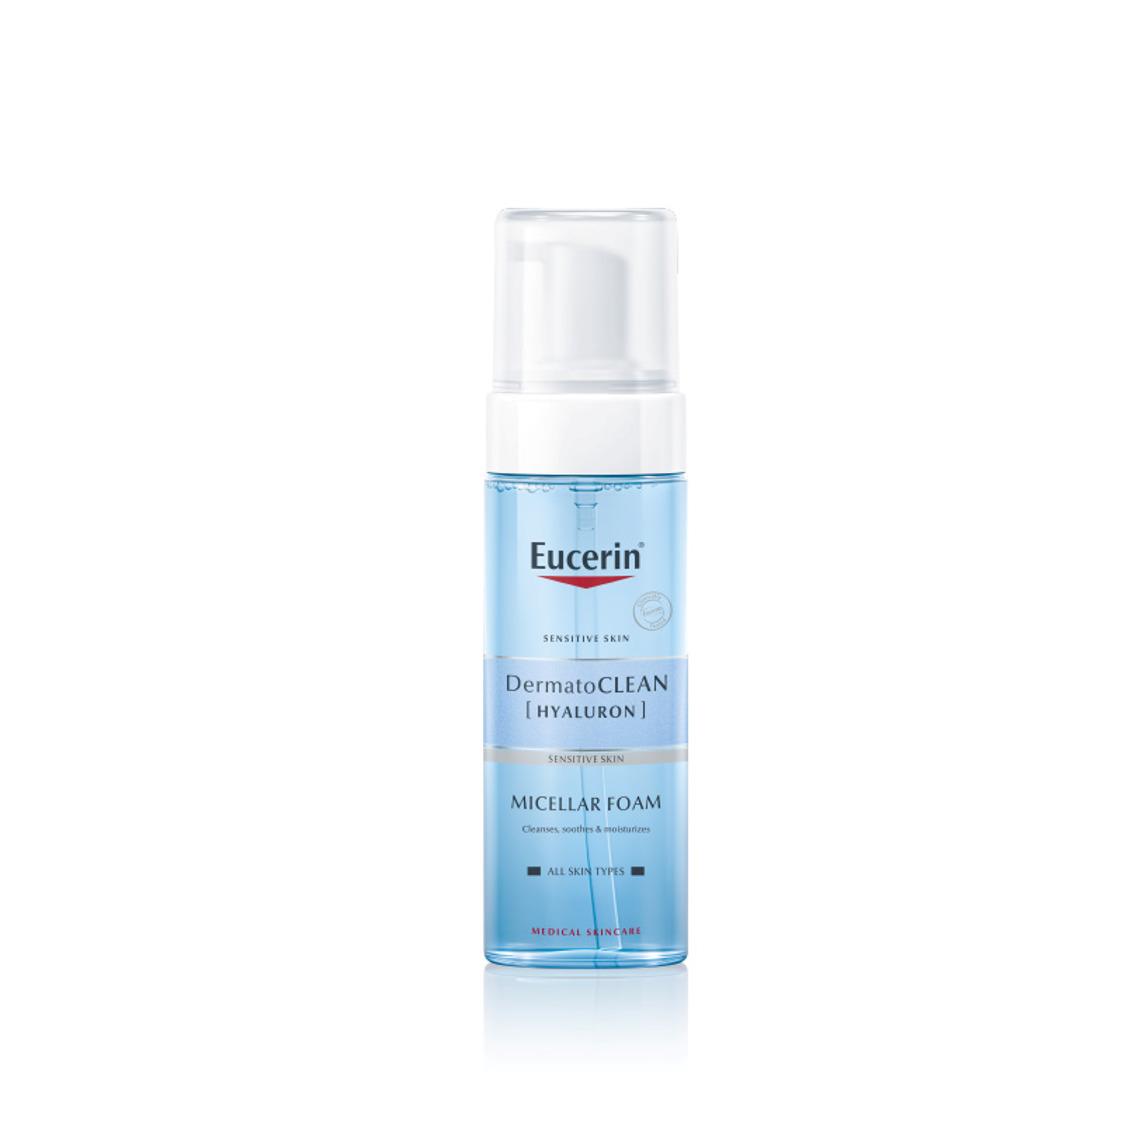 Bọt tẩy trang, rửa mặt Eucerin DermatoClean Hyaluron Micellar Foam 150ml